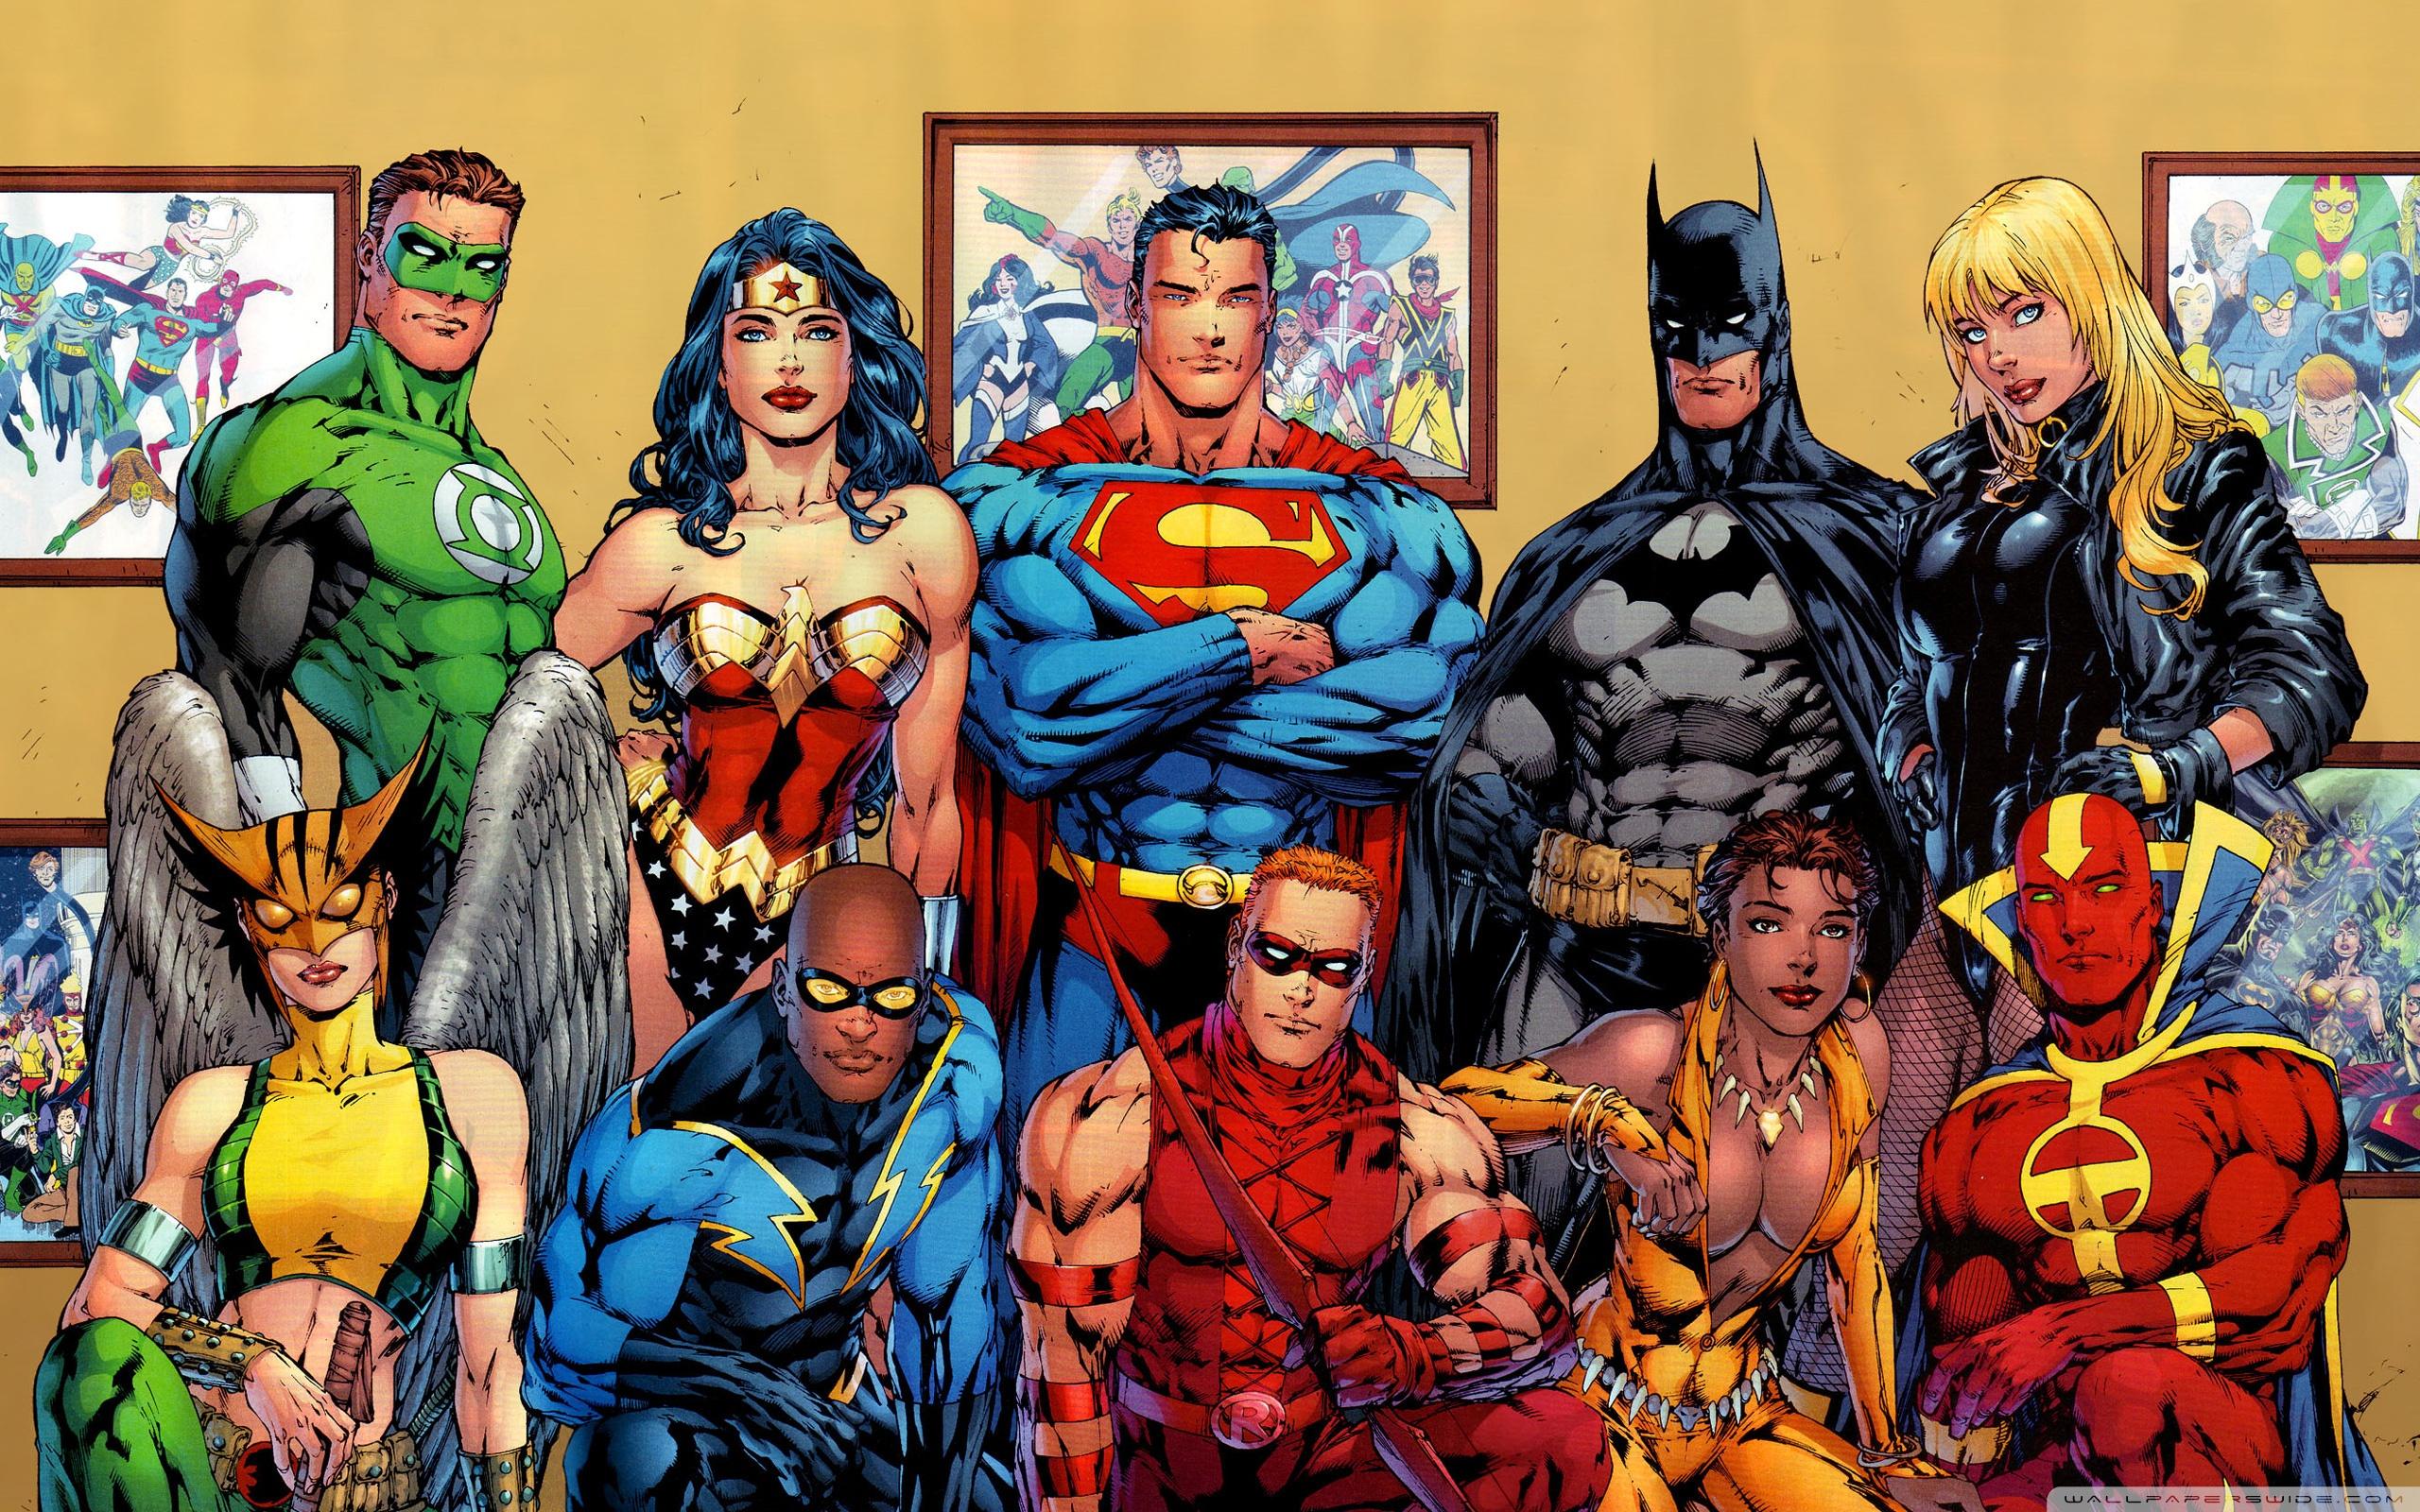 Marvel Comics Superheroes Wallpaper HD Wallpapers and iPhone 6 2560x1600